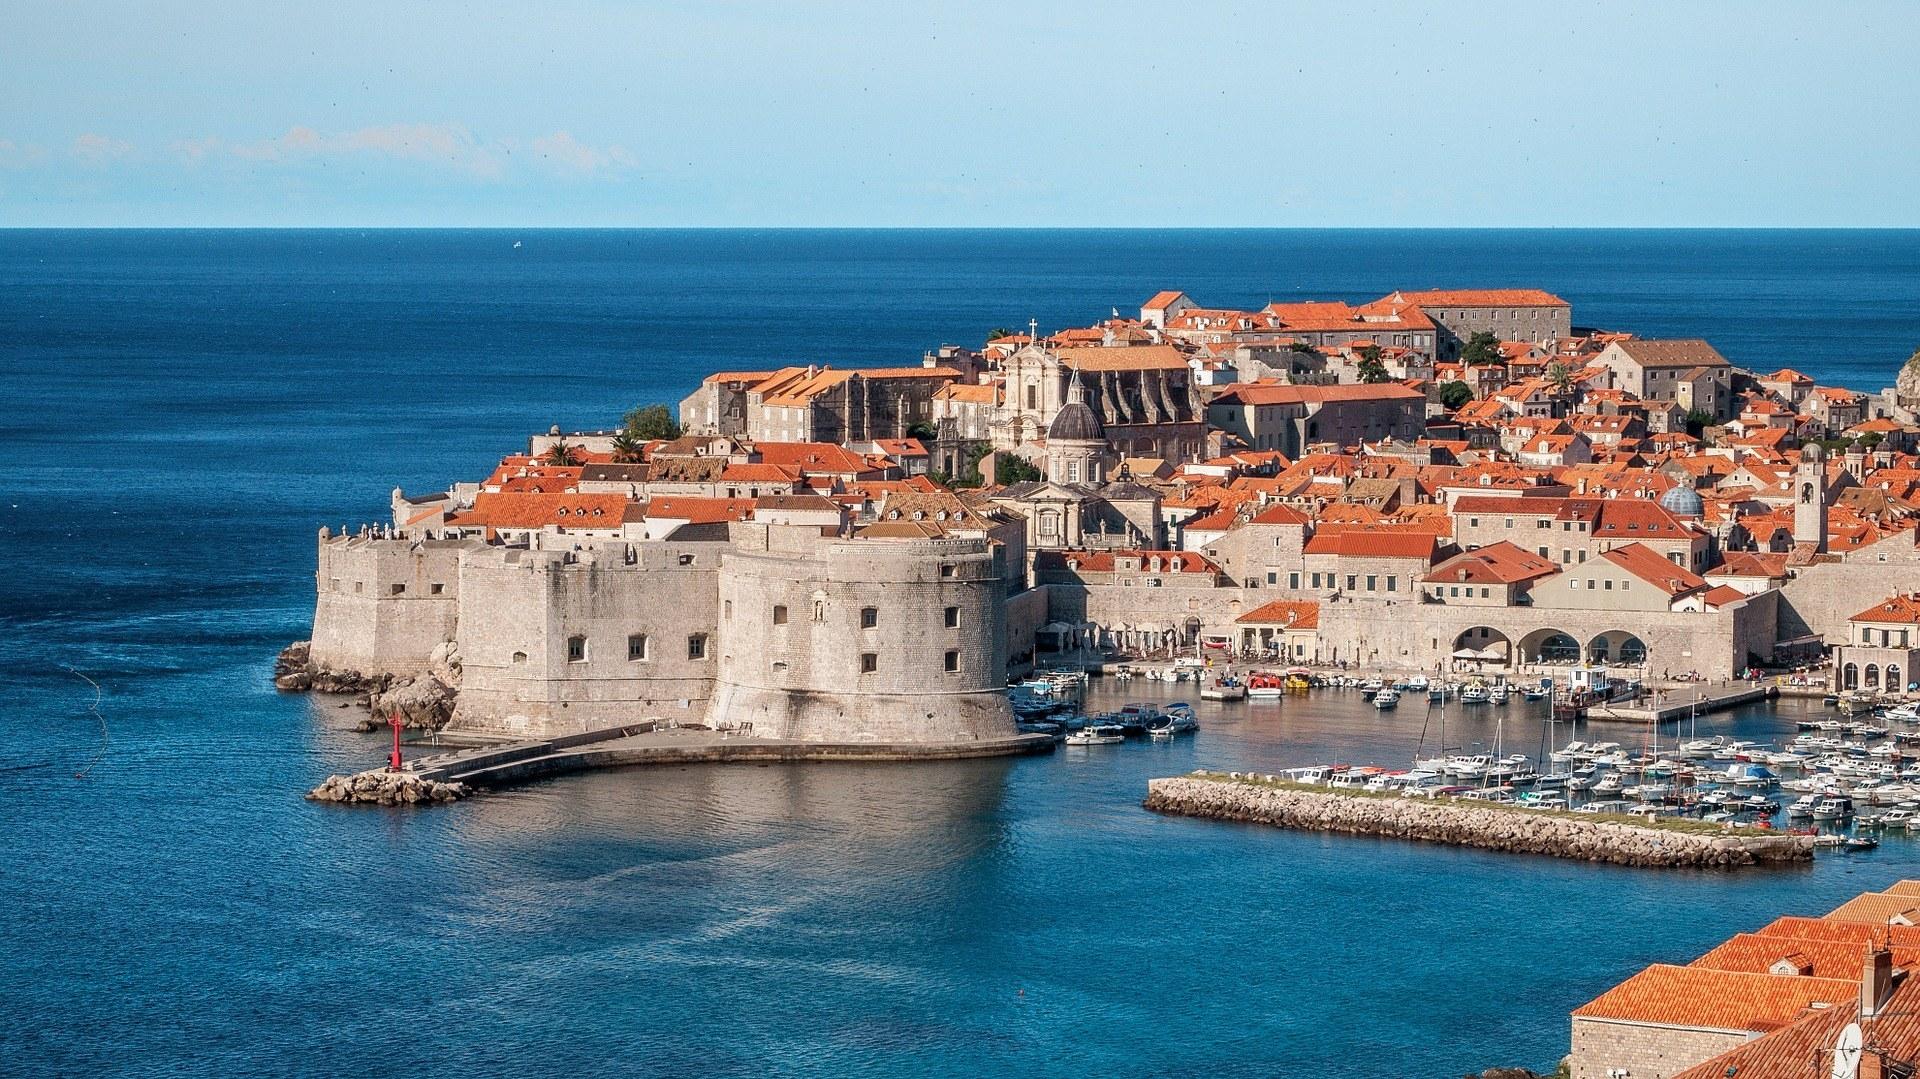 Dubrovnik on the coast of Croatia.